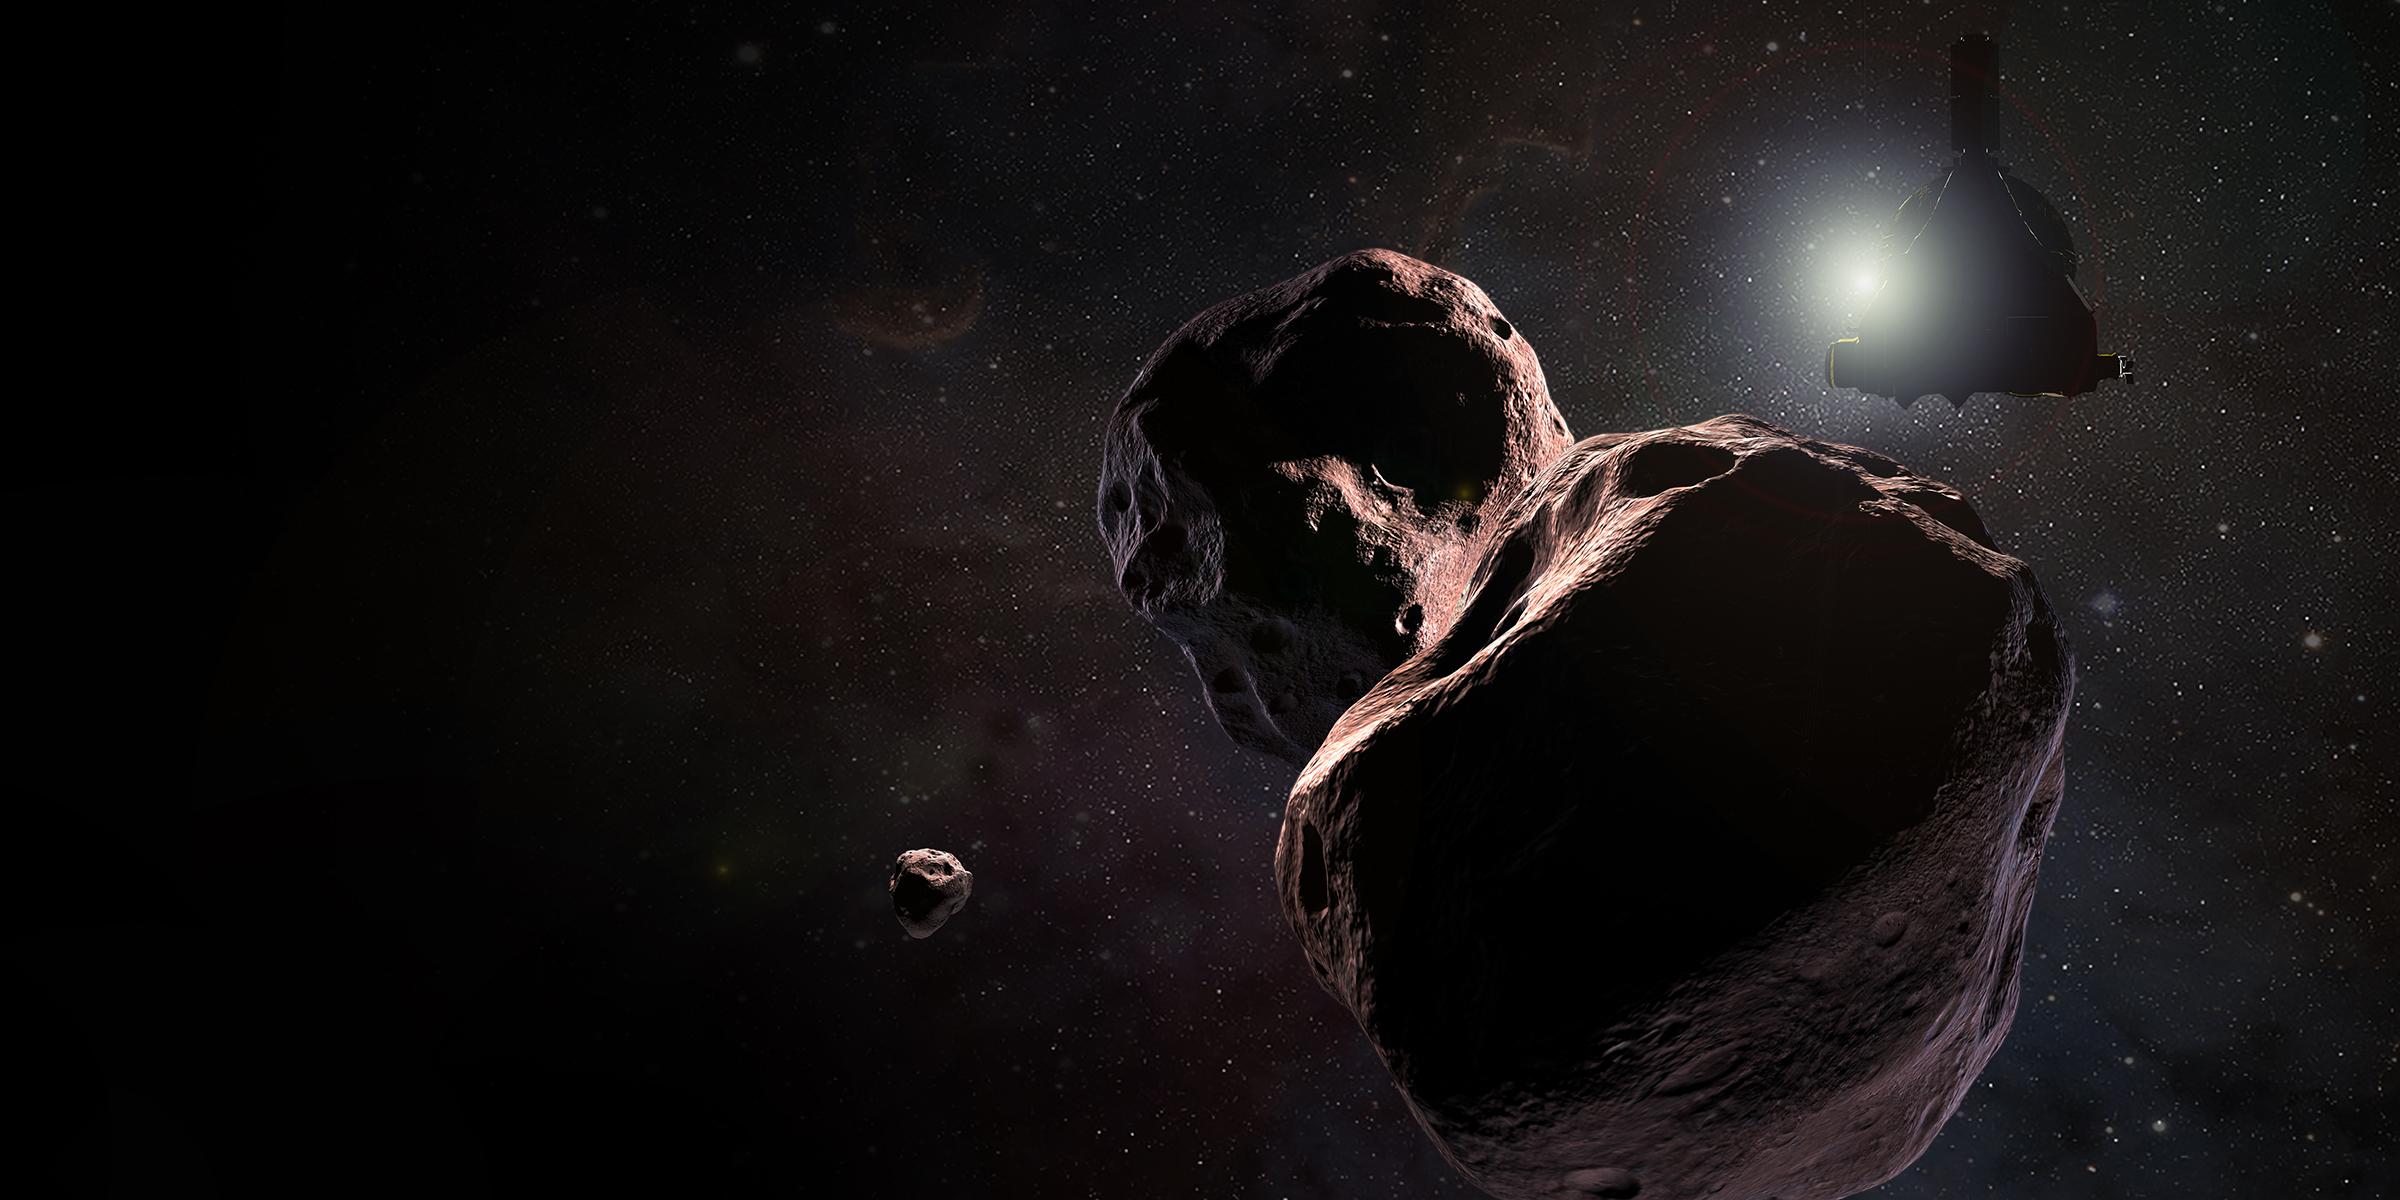 Artist's impression of NASA's New Horizons spacecraft encountering 2014 MU69, a Kuiper Belt object that orbits one billion miles or 1.6 billion kilometers beyond Pluto, on Jan. 1, 2019. Image Credit: NASA / JHUAPL / SwRI / Steve Gribben